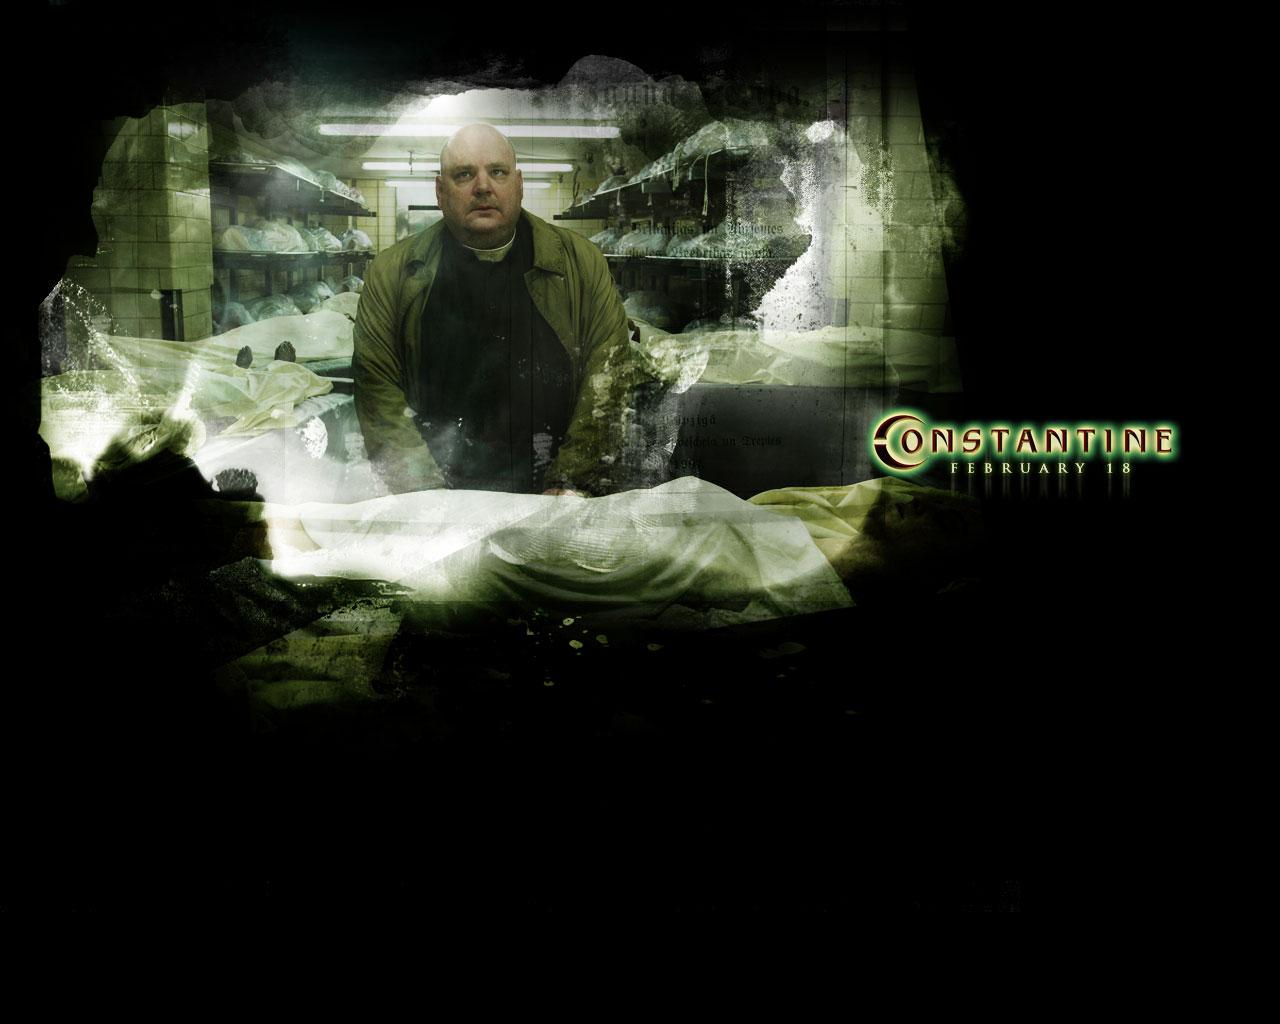 Constantine 1639413 Hd Wallpaper Backgrounds Download